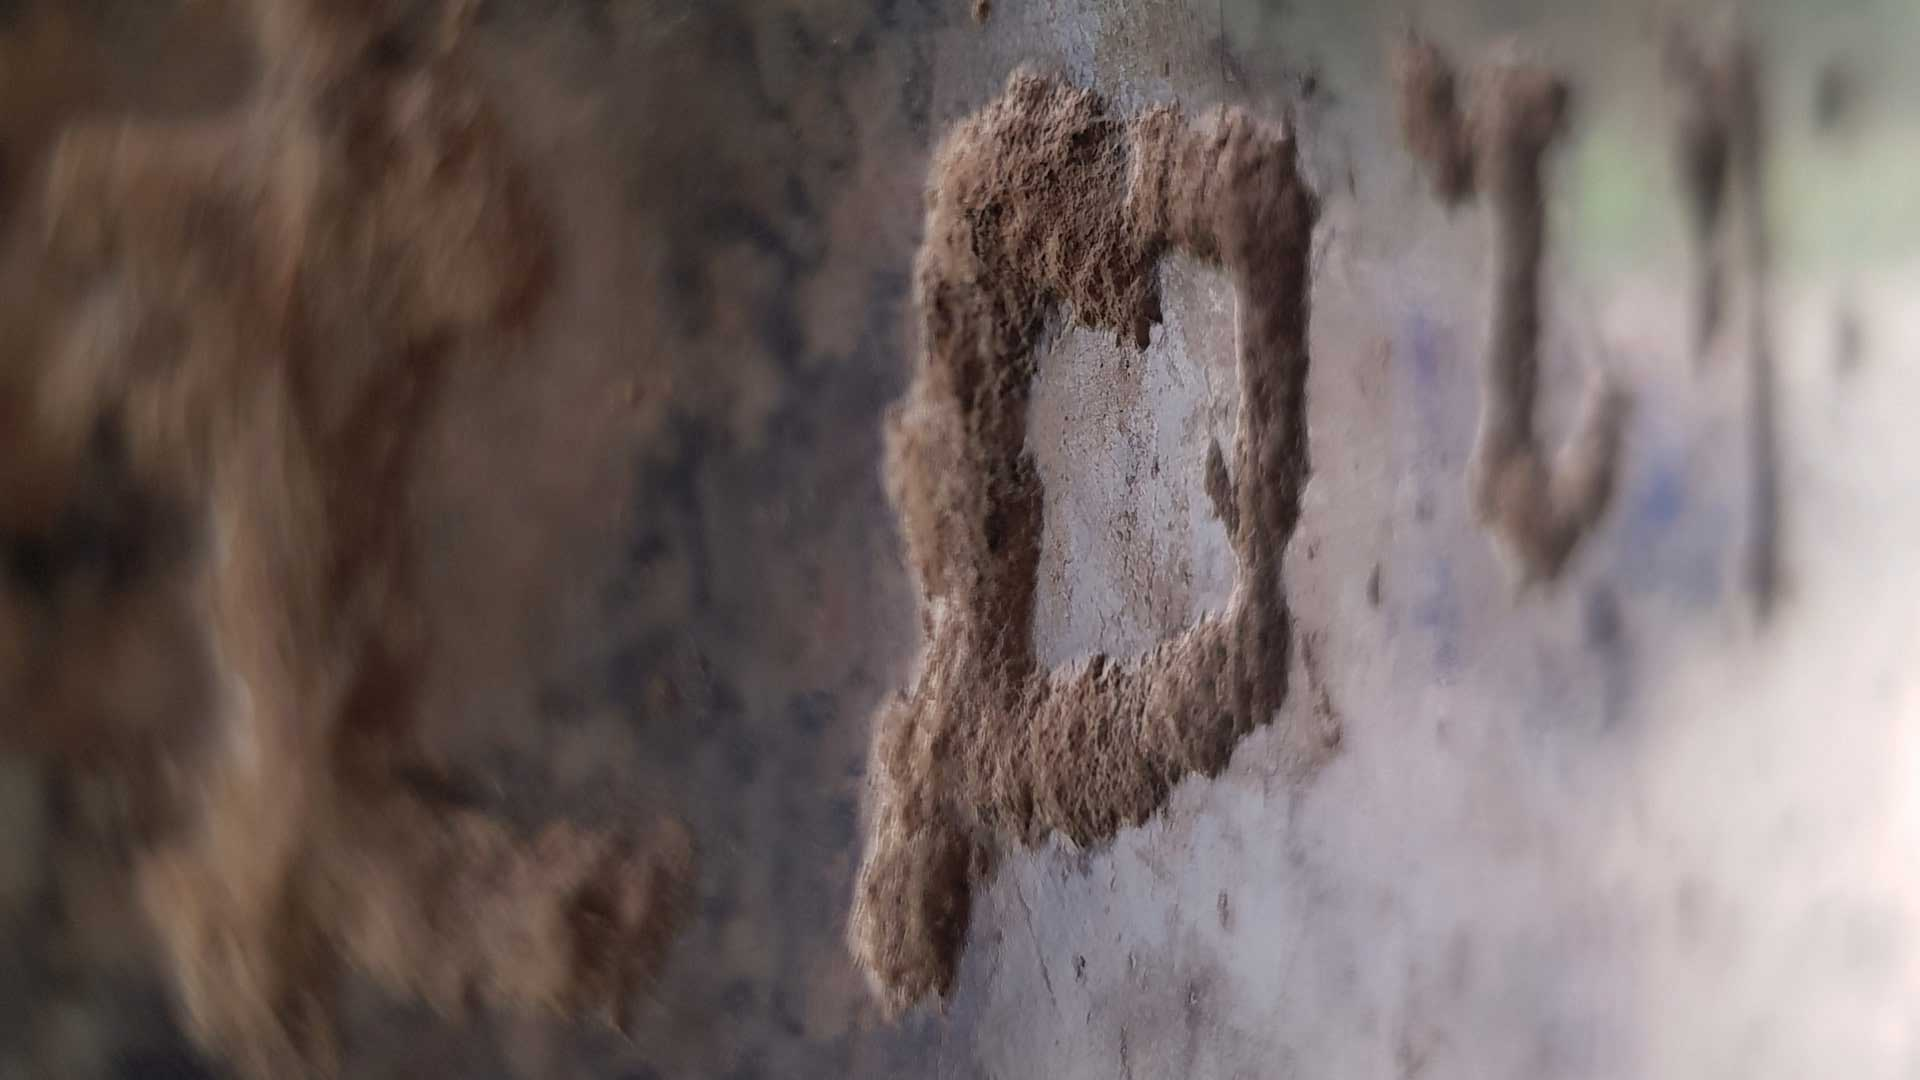 Barabar-BAM-film-granit-miroir-pyramide-inde-yoga-archeologie-baleine-granit-jerome-gadeyne